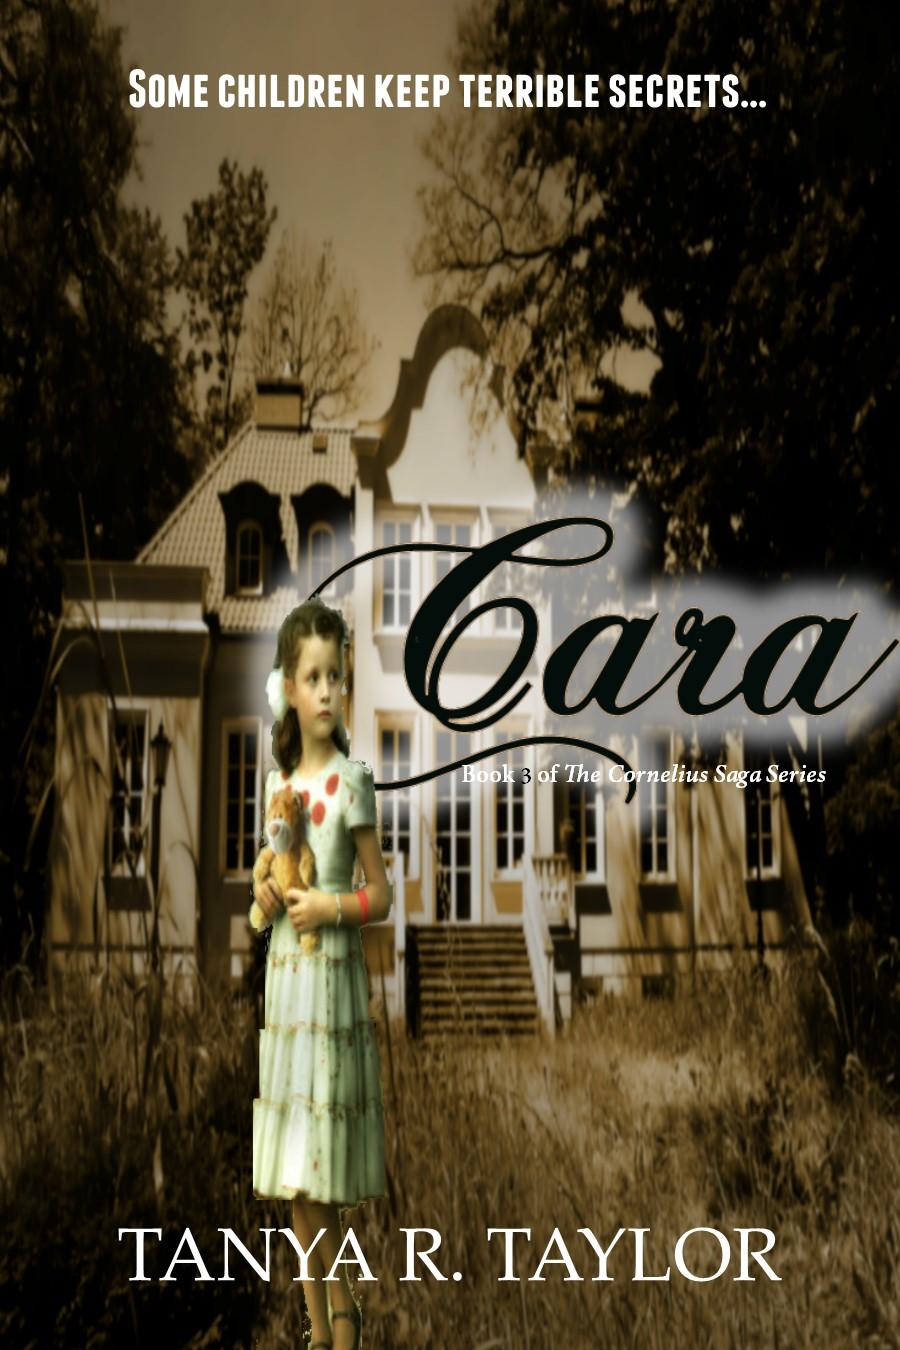 CARA (Cornelius book 3) NEWEST FRESHEST COVER